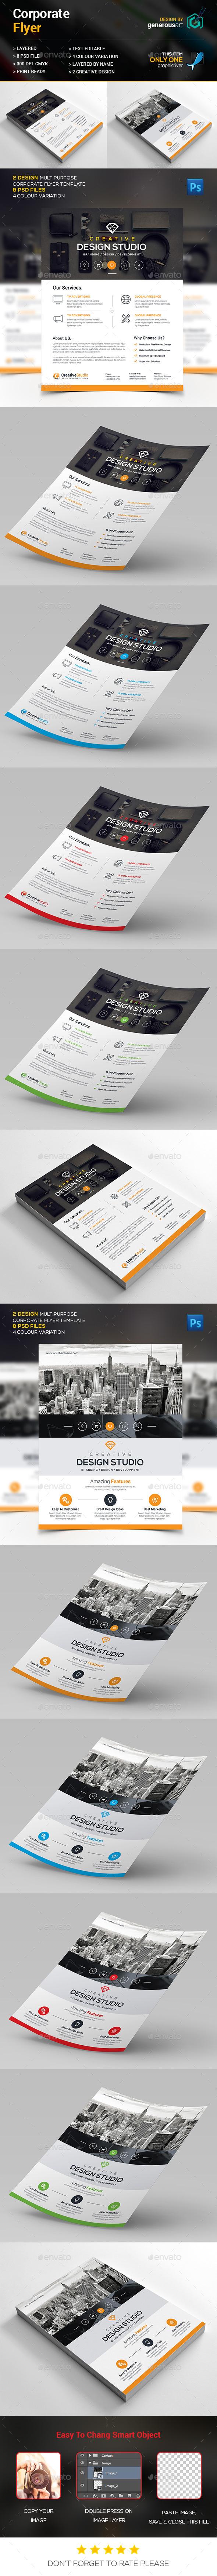 Corporate Design Flyer - Corporate Flyers